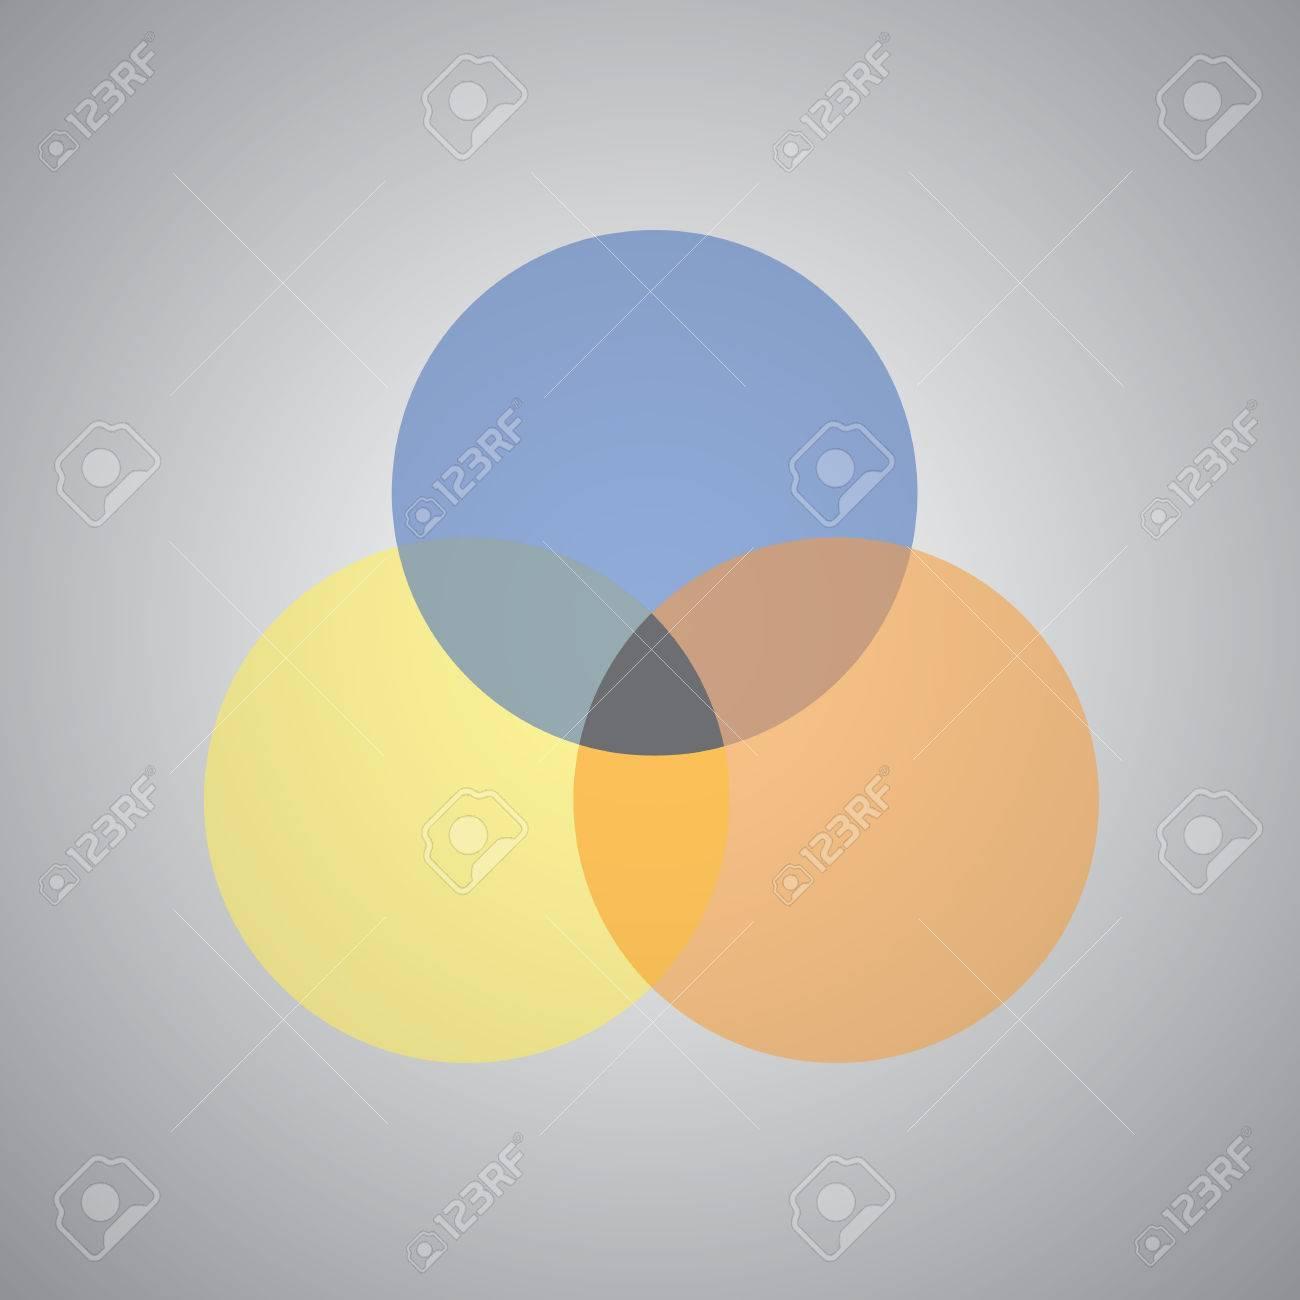 vector three intersection circles design - 67723522